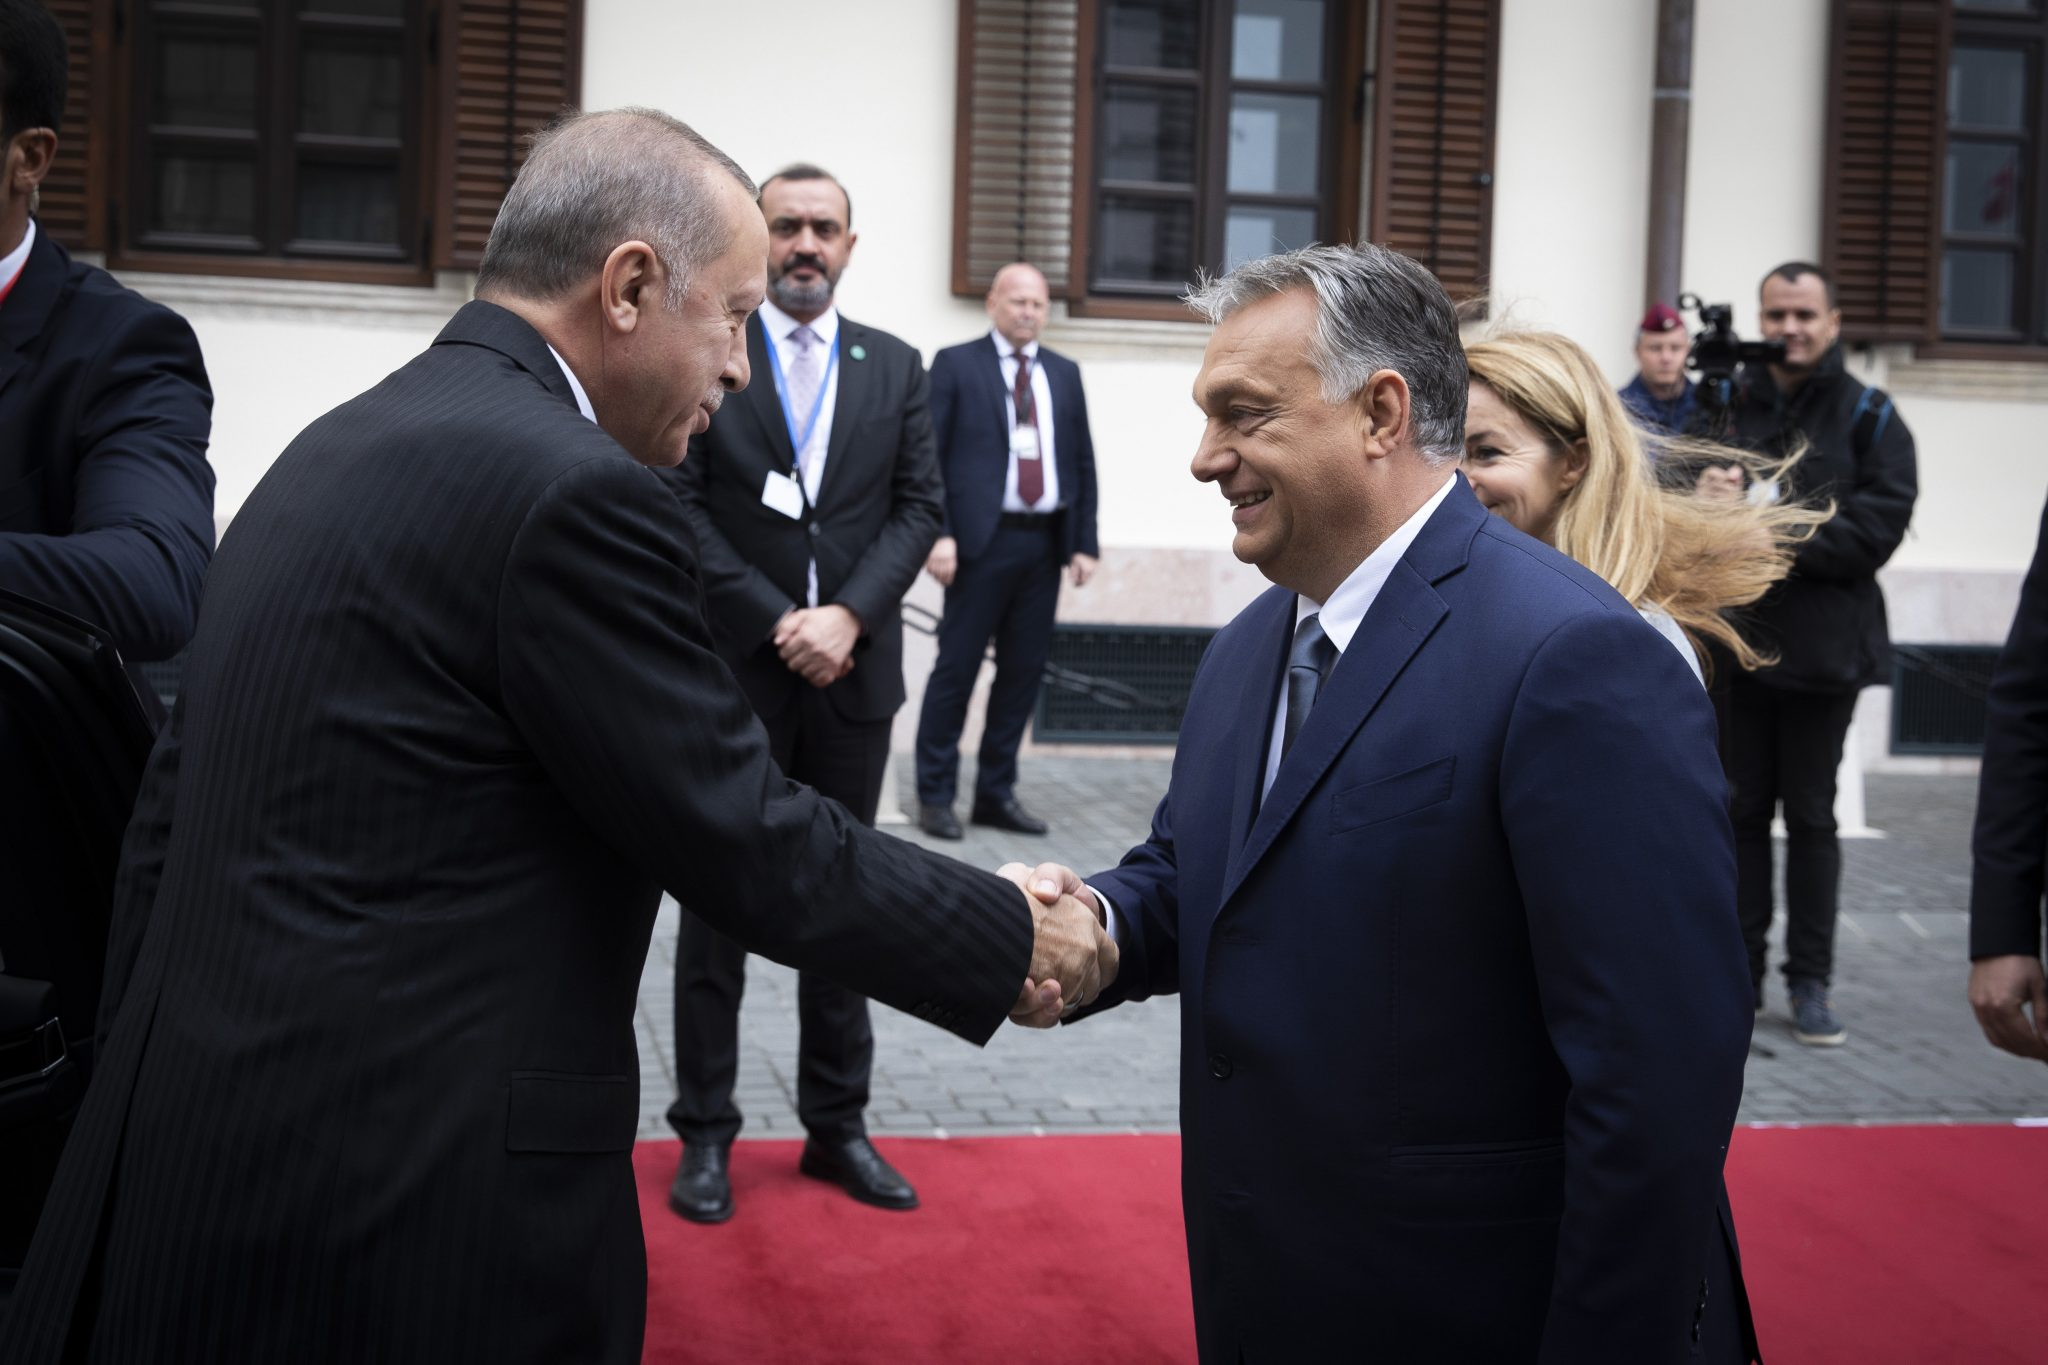 Orbán: Turkey 'Strategic Partner' Every Hungarian Should Respect